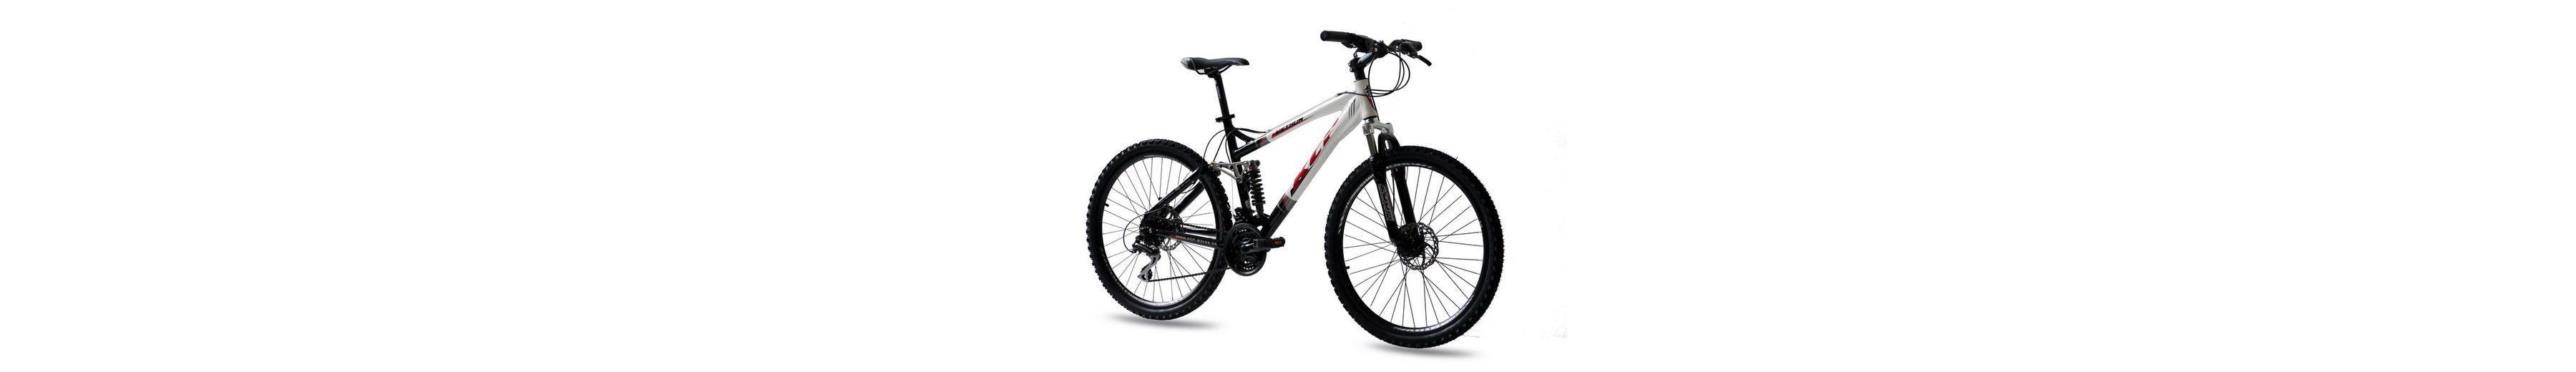 Mountainbike »Vetron, 66,04 cm (26 Zoll)«